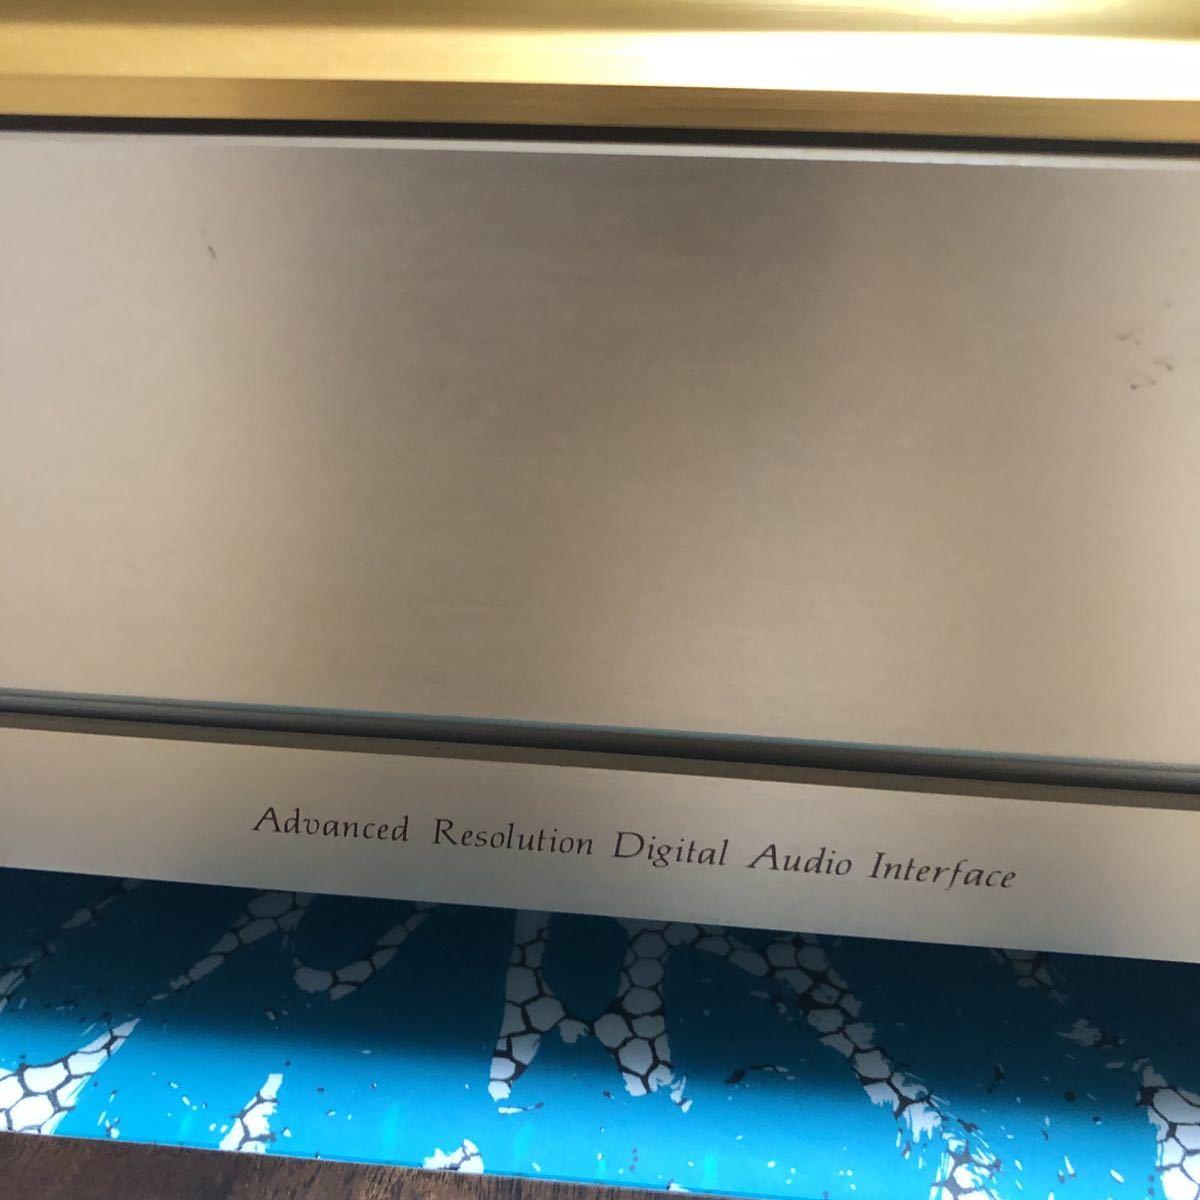 ◆Pioneer パイオニア VSA-AX10Ai AVマルチチャンネルアンプ 2003年製 ジャンク扱い外観並品_画像3